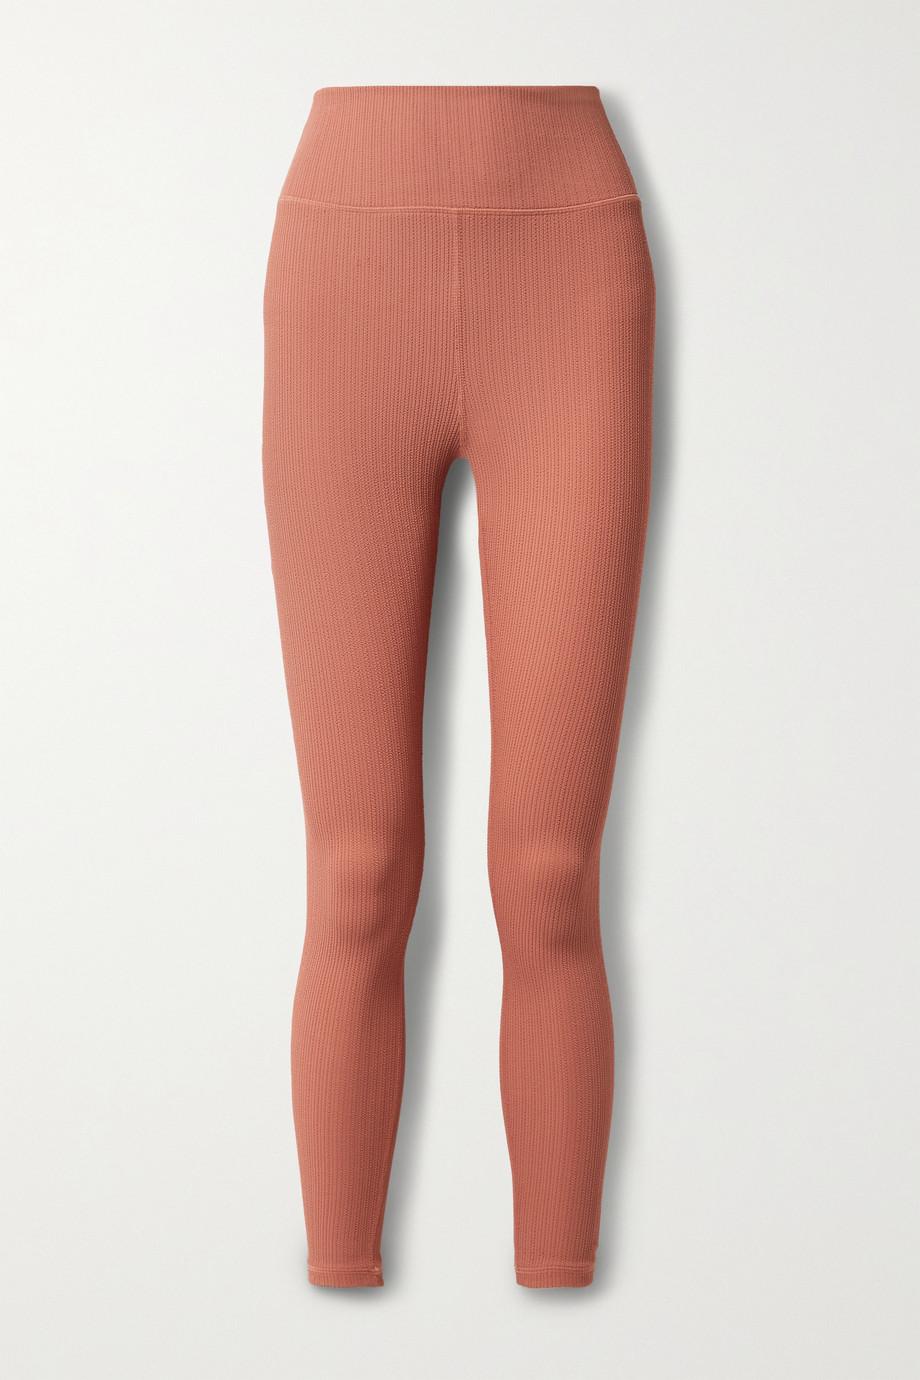 The Upside Dance stretch-jacquard leggings